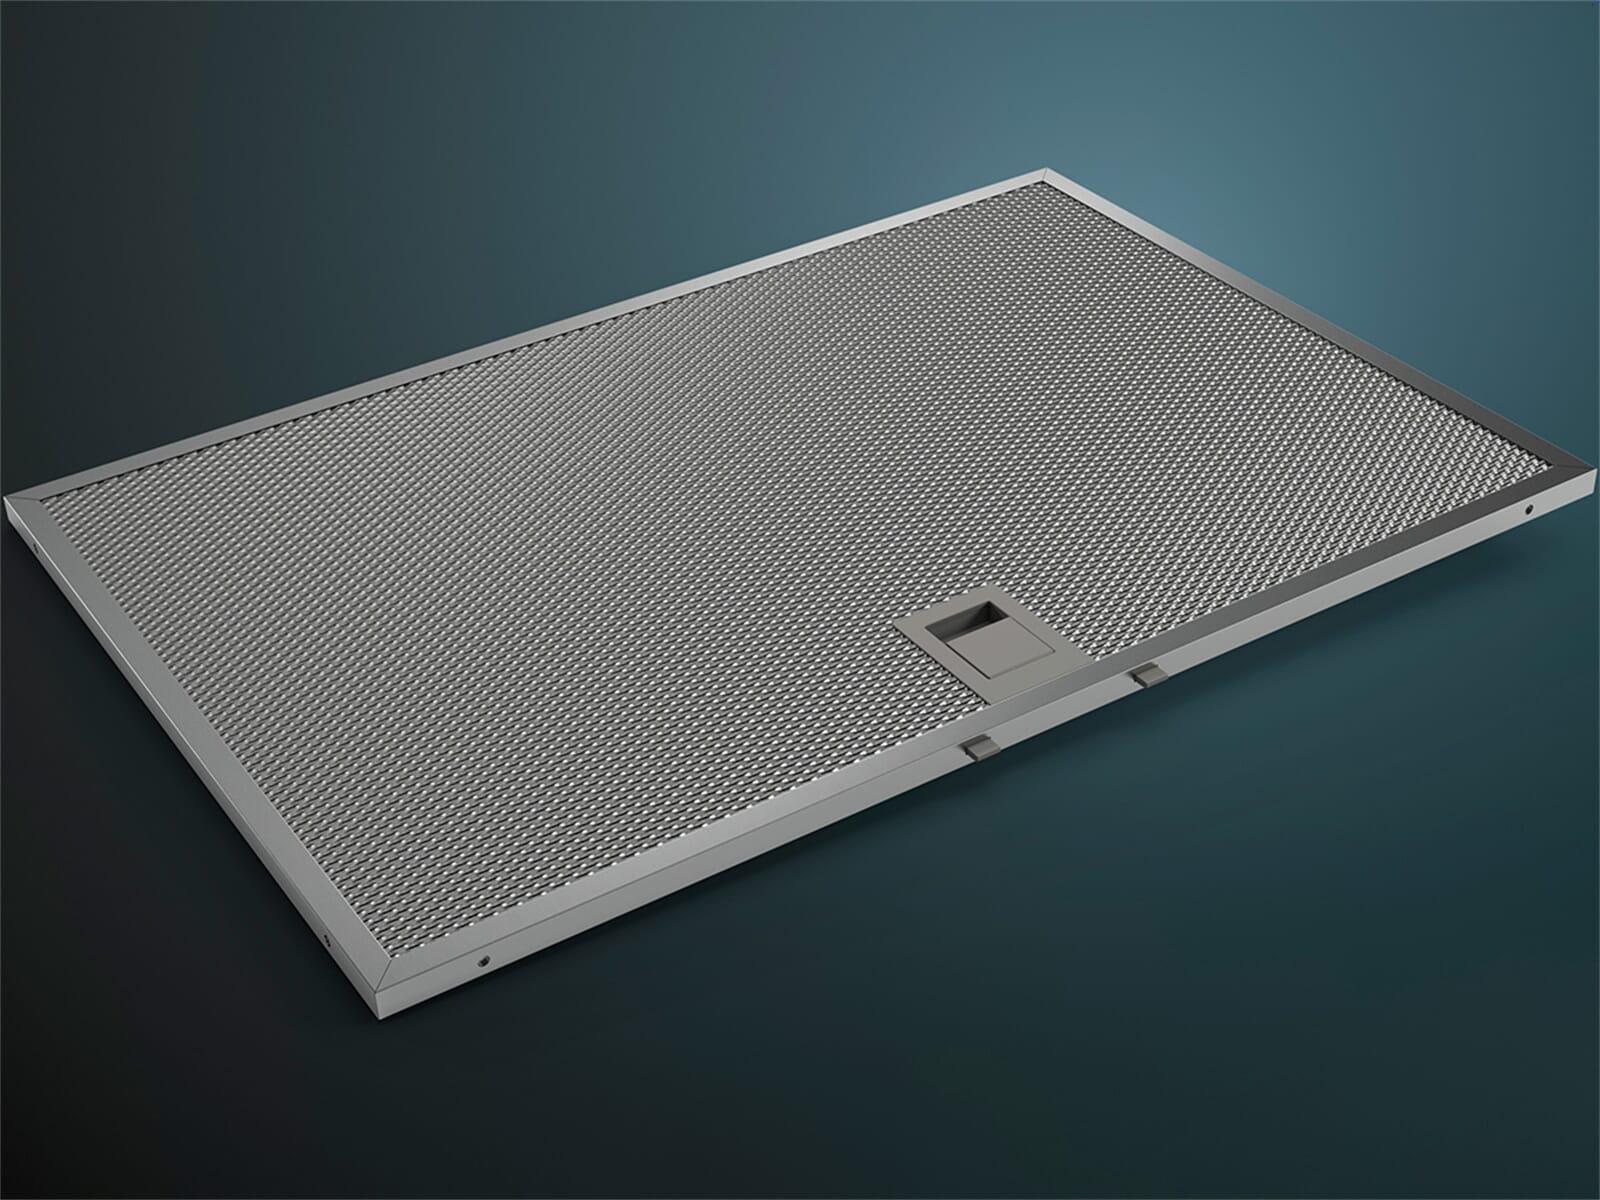 Siemens dunstabzugshaube filter symbol